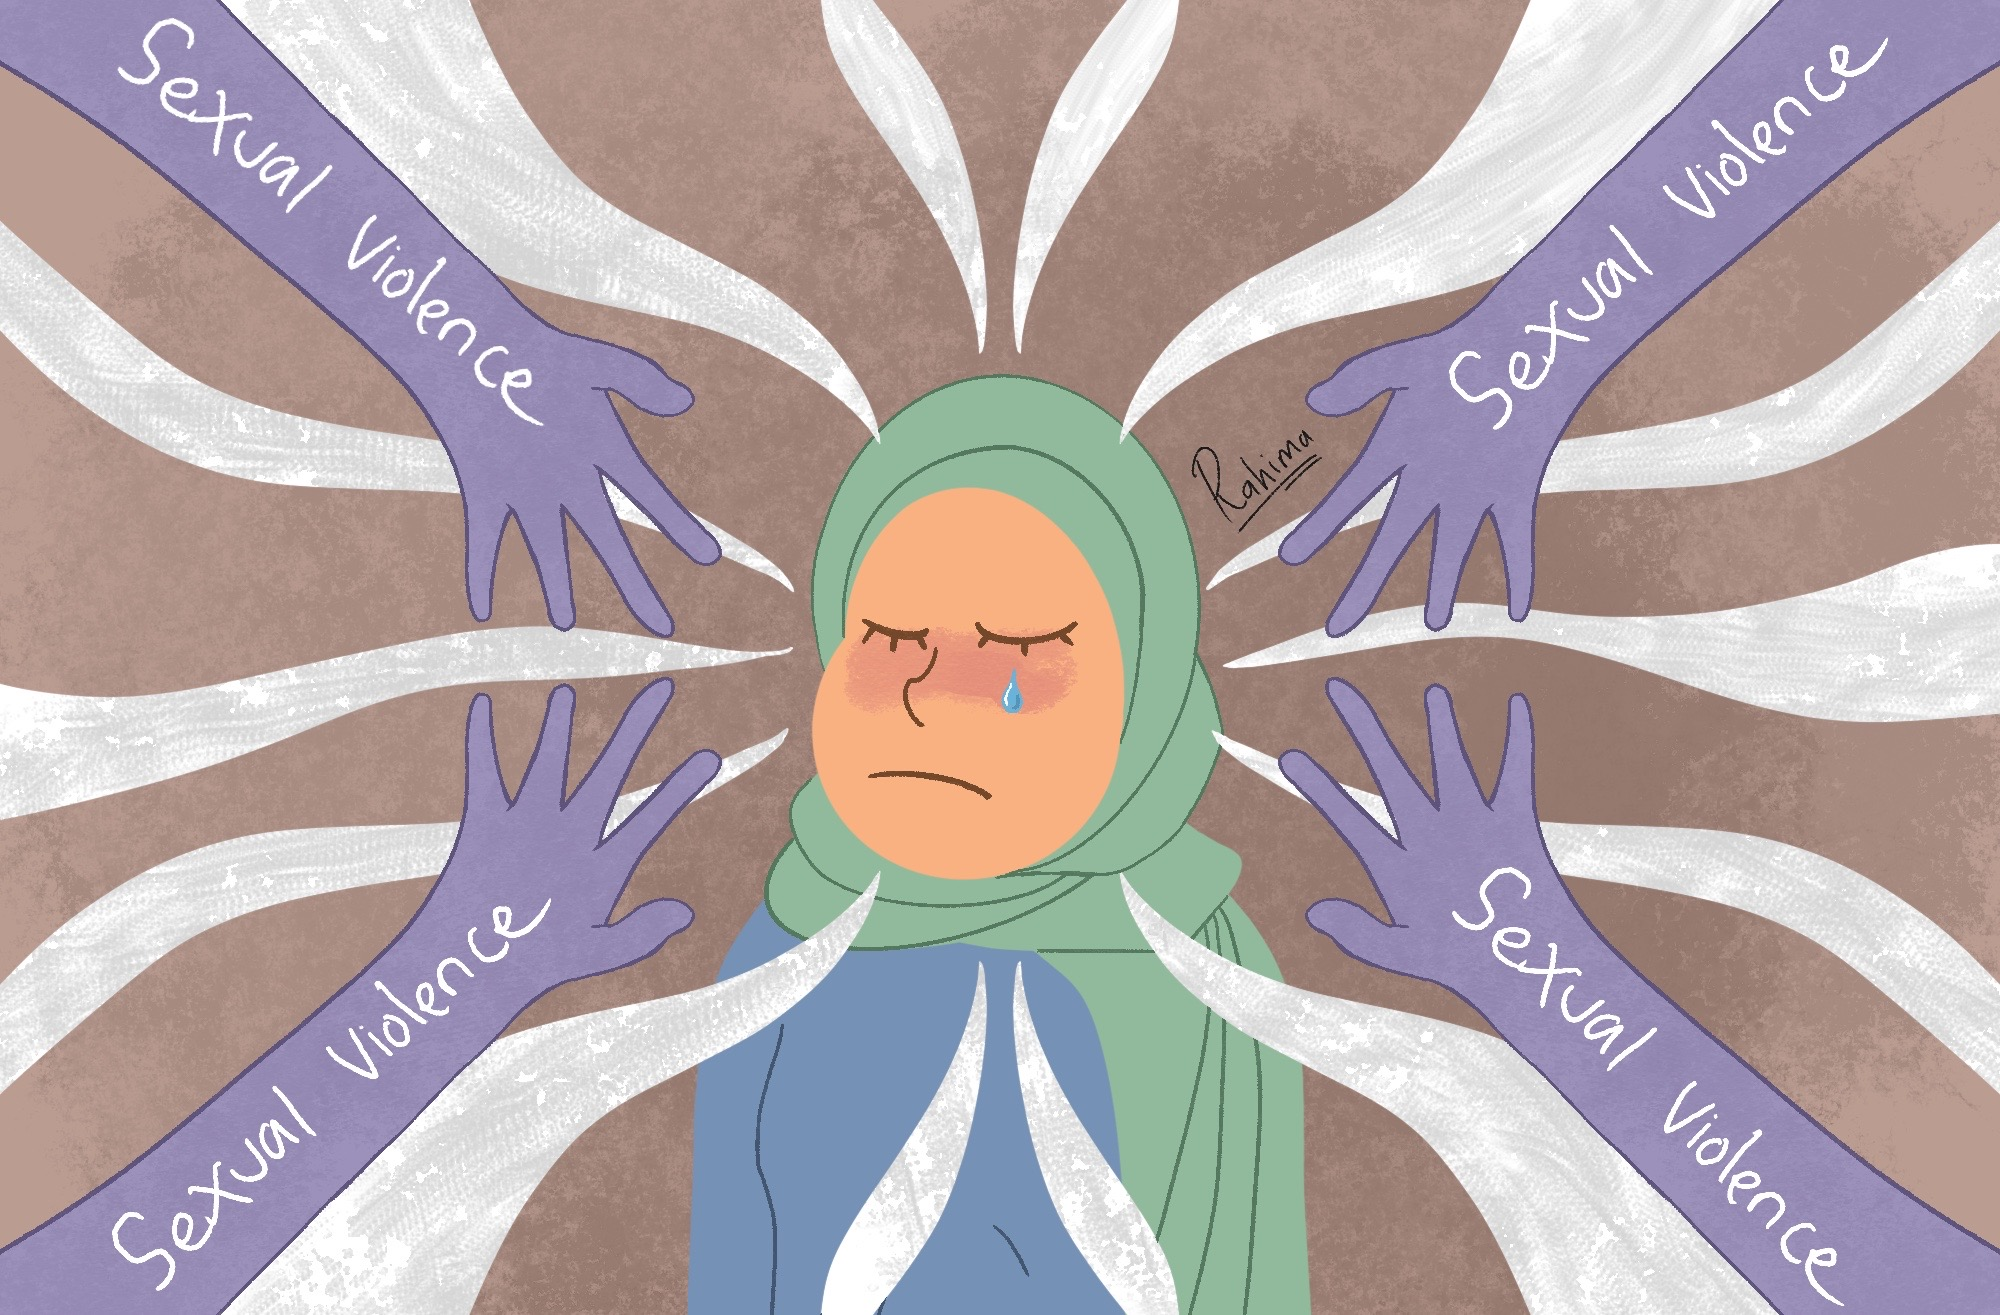 Solusi Islam Mengatasi Pelecehan Seksual pada anak